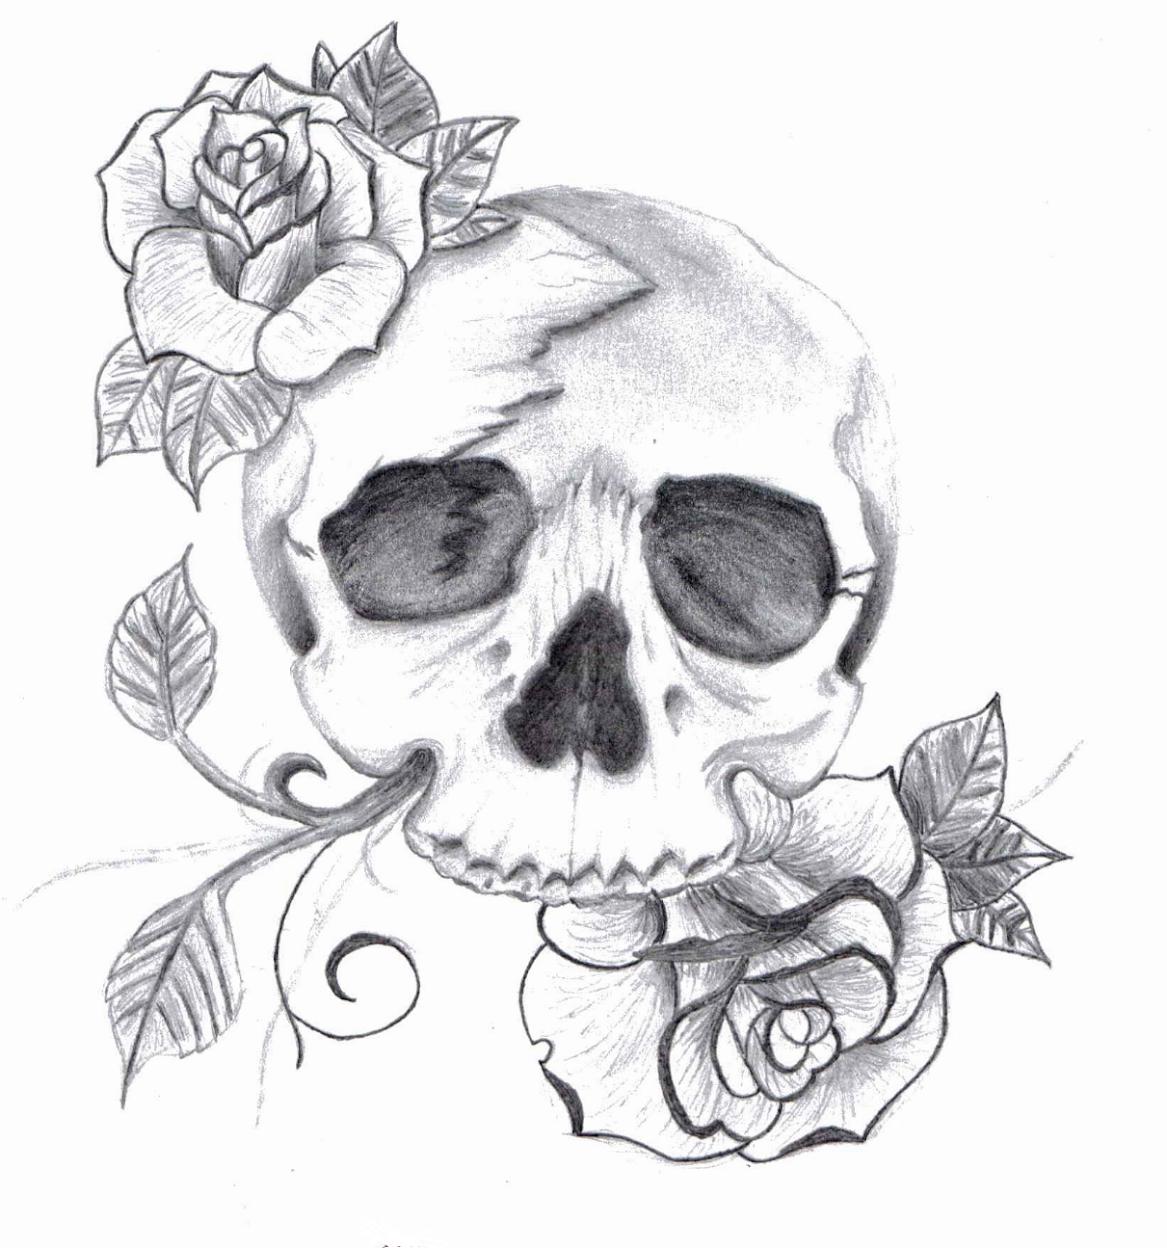 Cool Skull Sketches Skull drawings